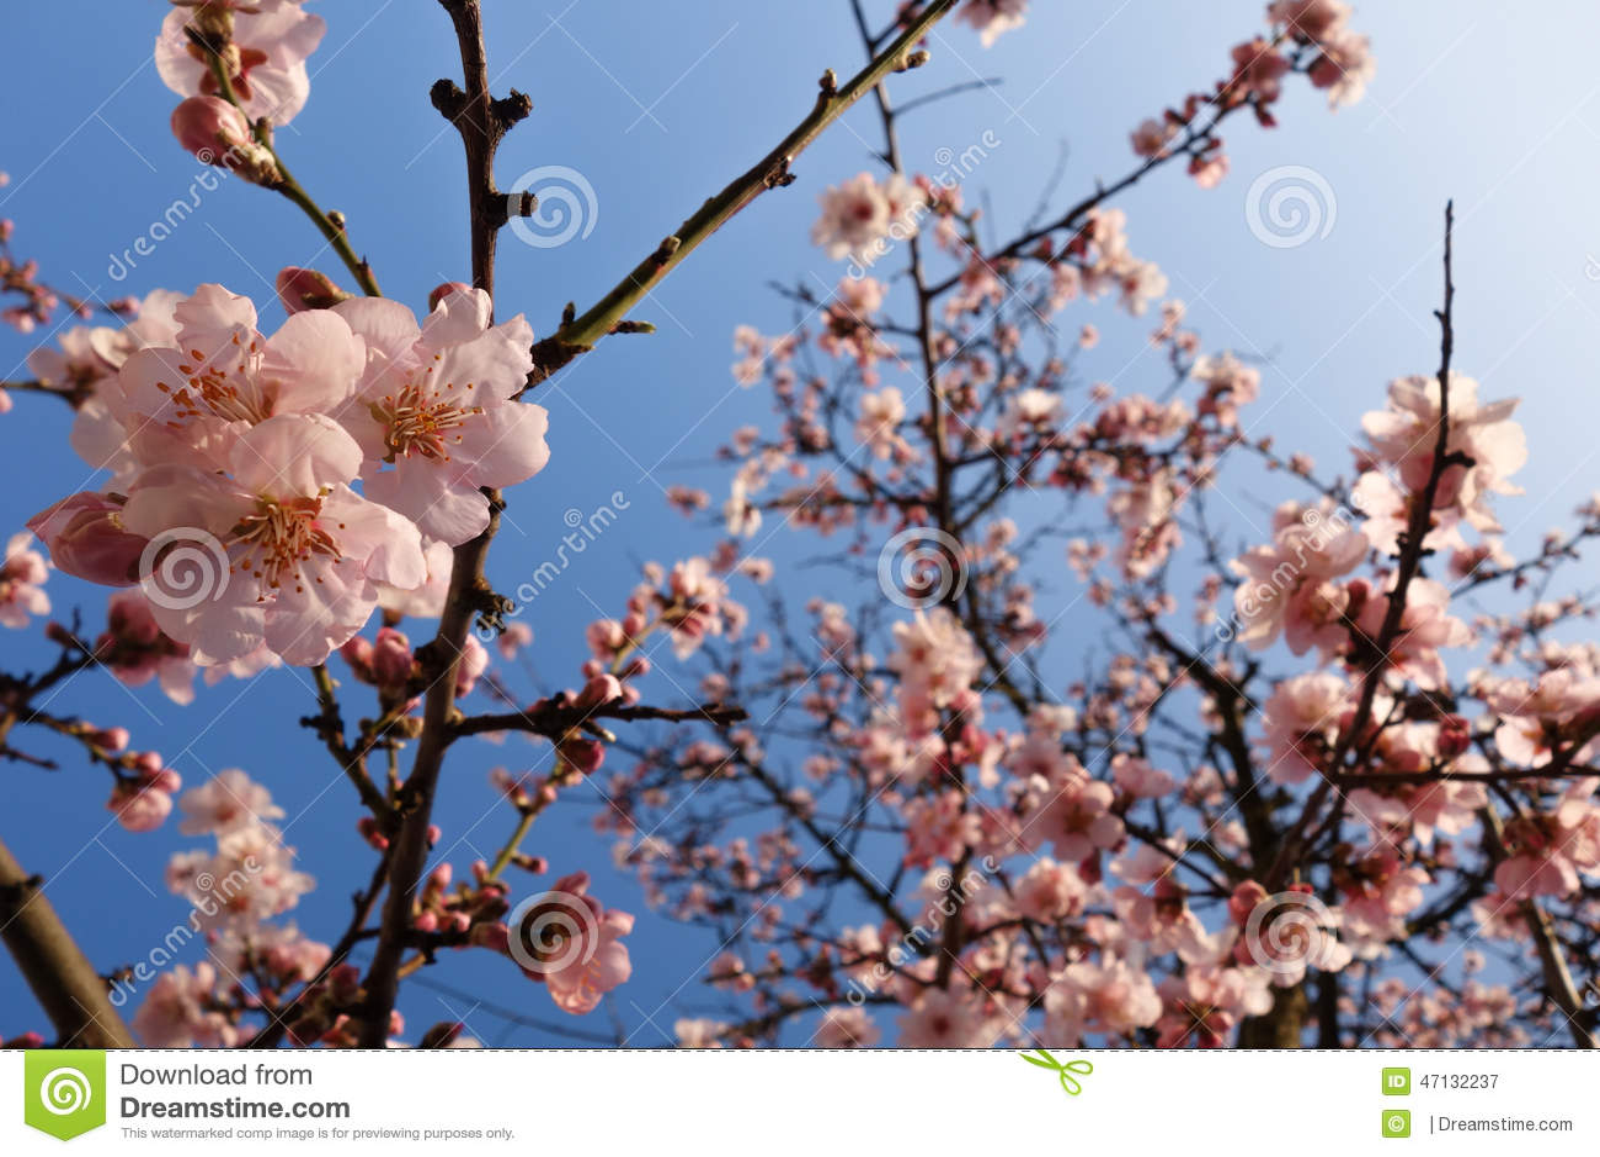 Japans Cherry Blossom During Springtime